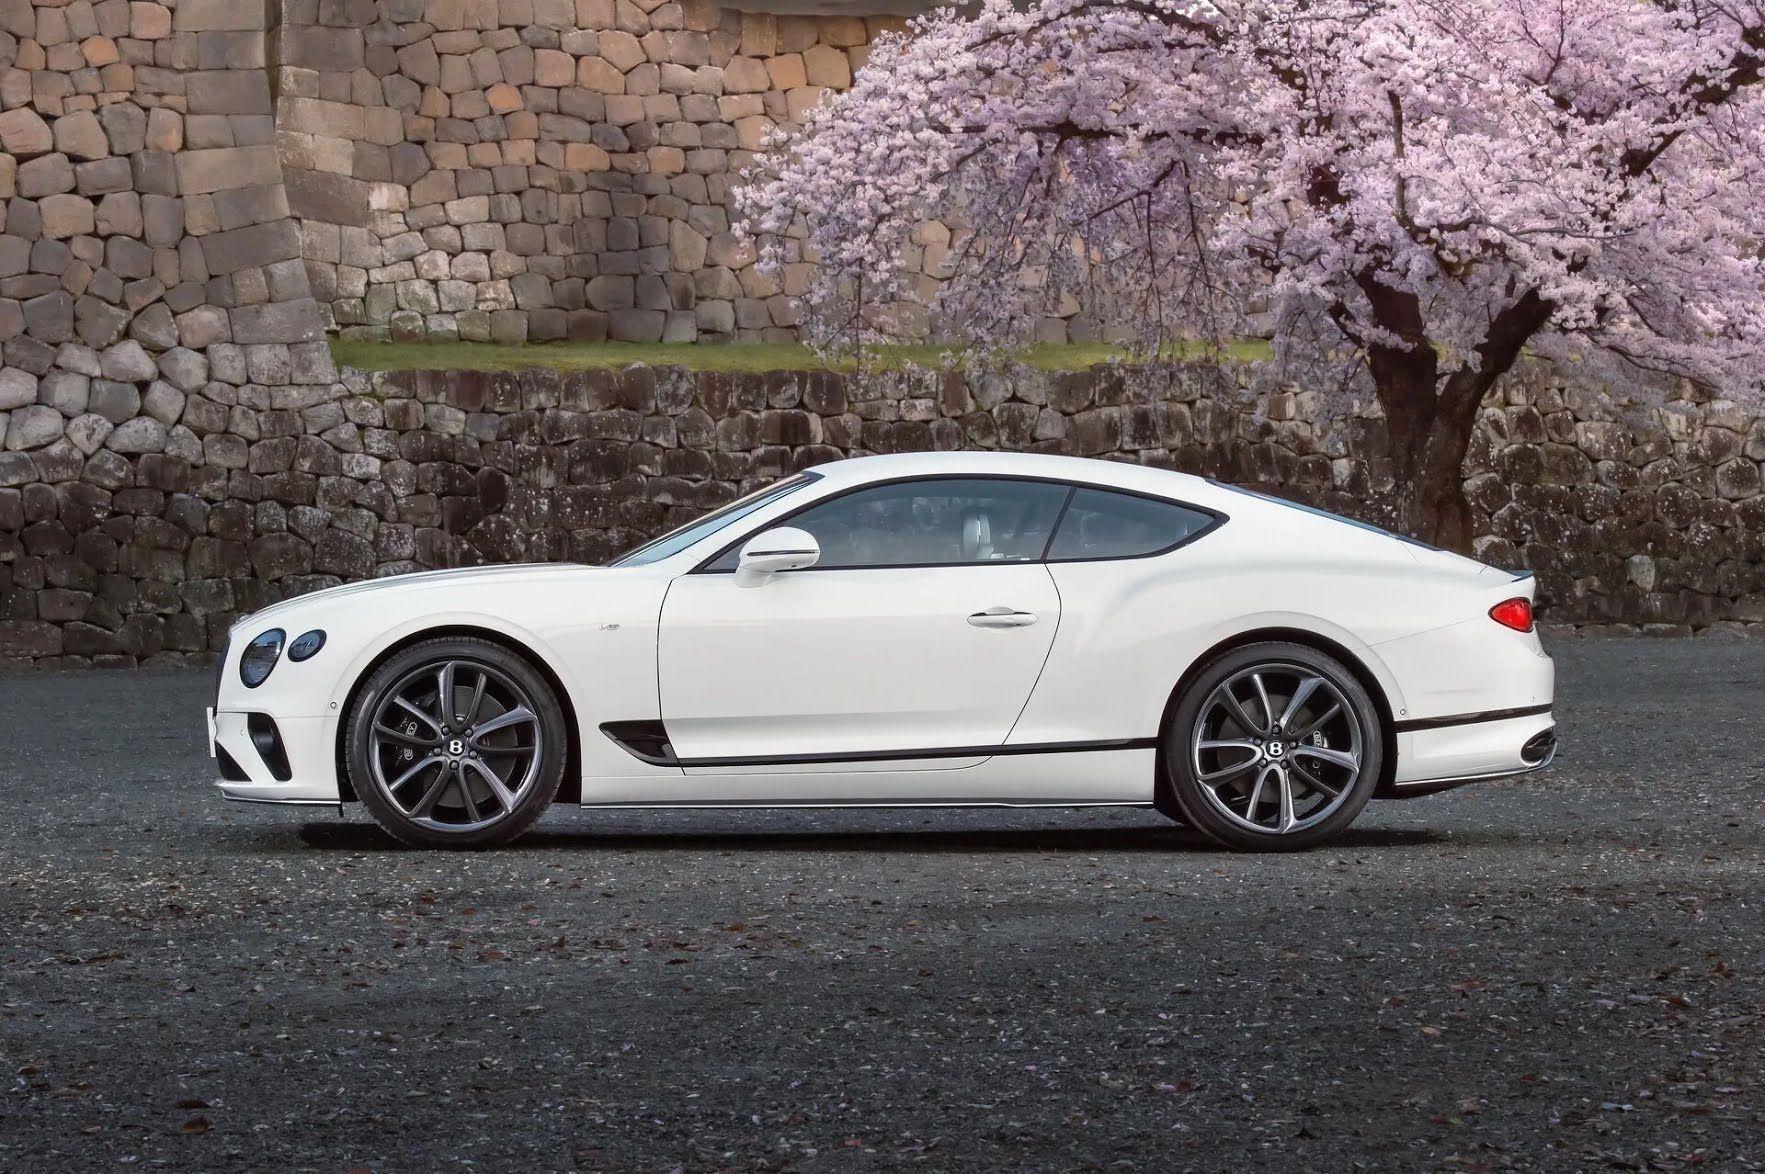 Один из 10 Bentley Continental GT V8 Equinox Edition